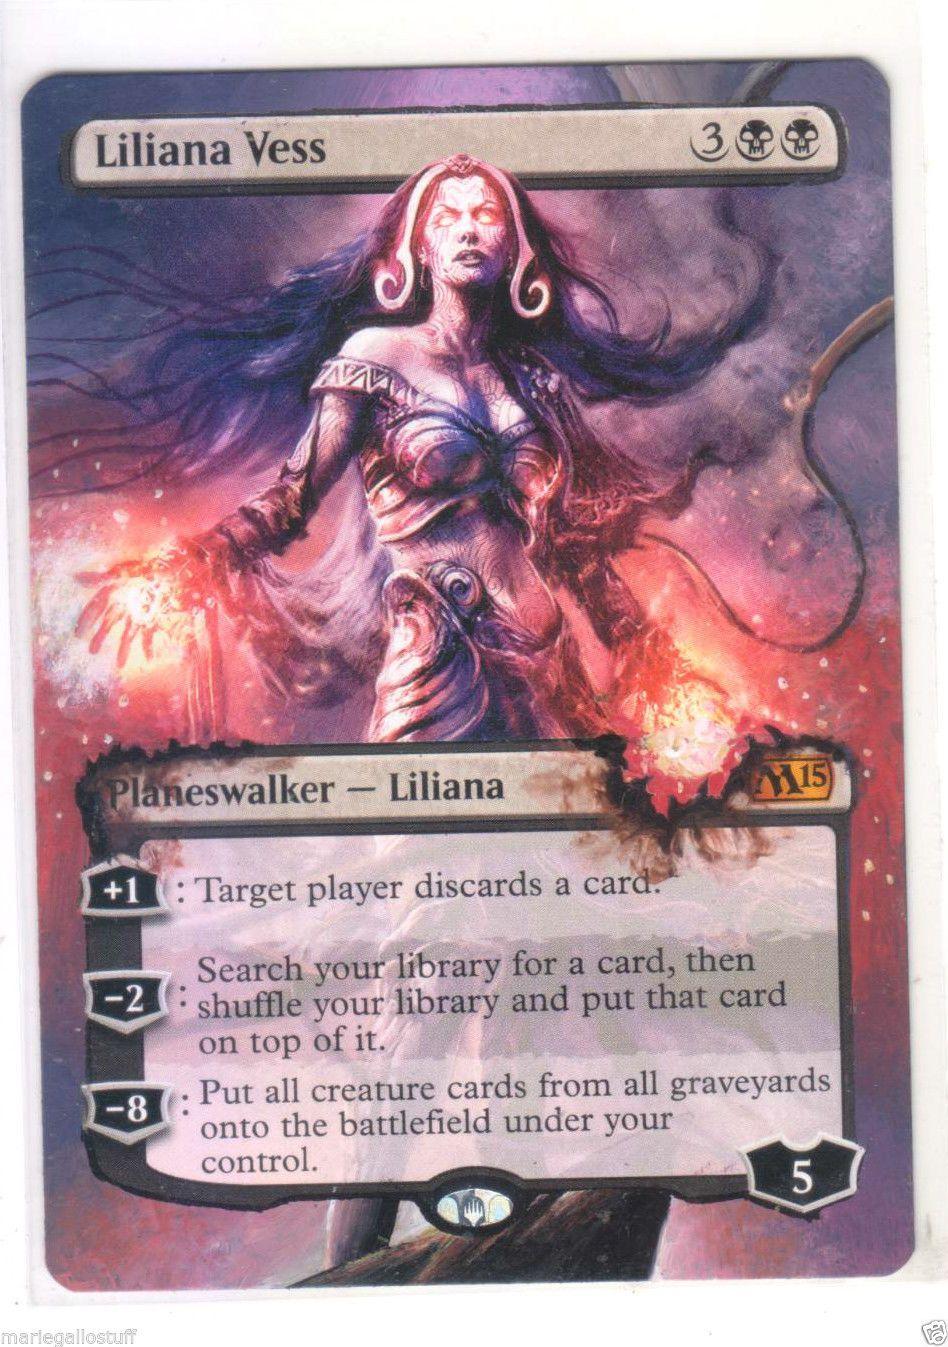 Liliana Vess Hand Painted Altered Art Extended Art Magic Gathering Mtg M15 Ebay Magic The Gathering Cards Magic The Gathering Magic Card Game